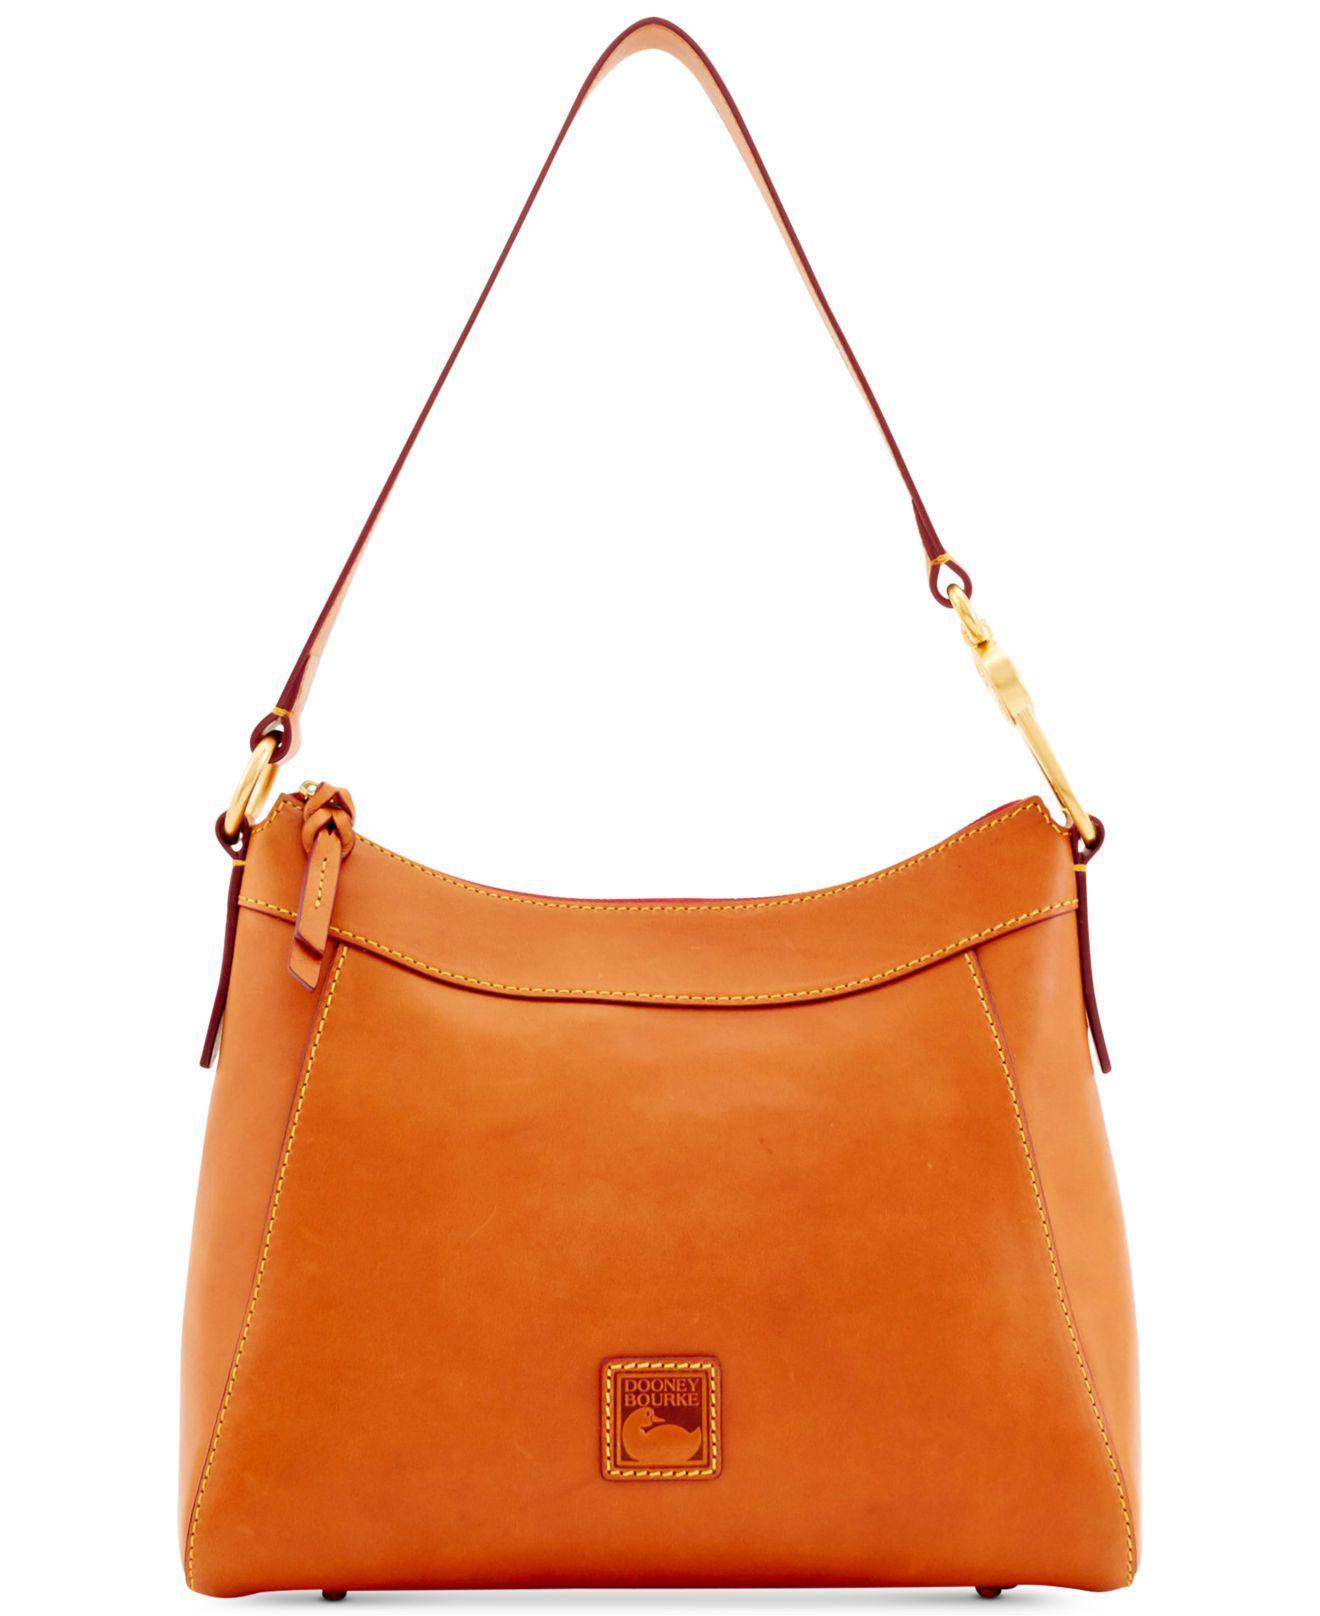 62e4802d909e Dooney   Bourke. Women s Natural Florentine Cassidy Small Leather Hobo